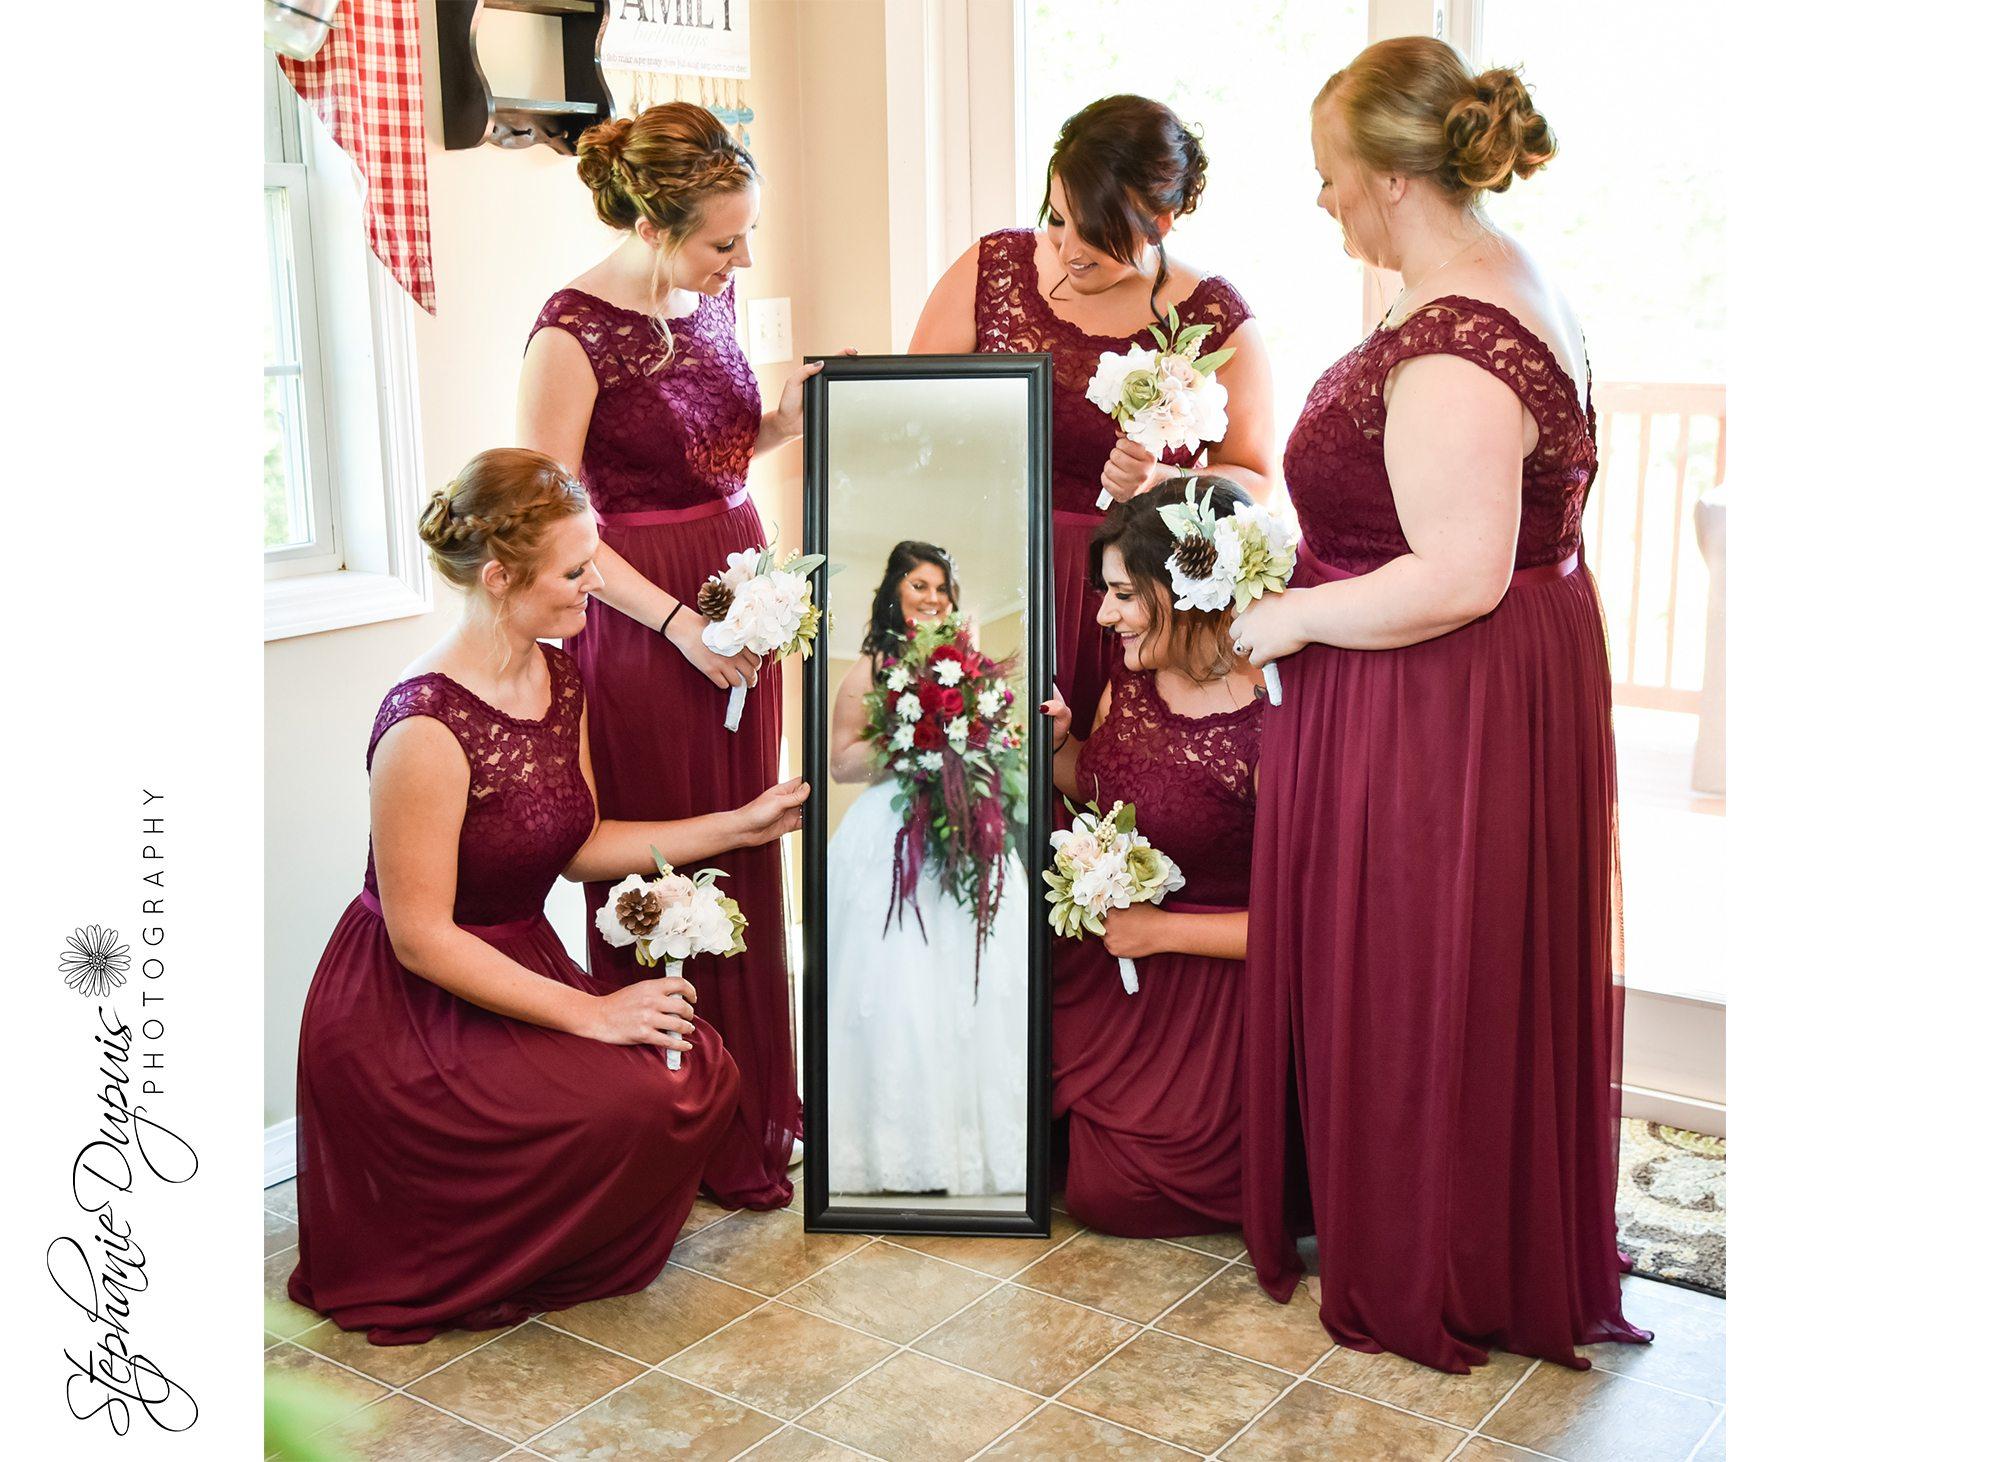 Berlin Wedding Photographer 05 - Portfolio: Brown Wedding